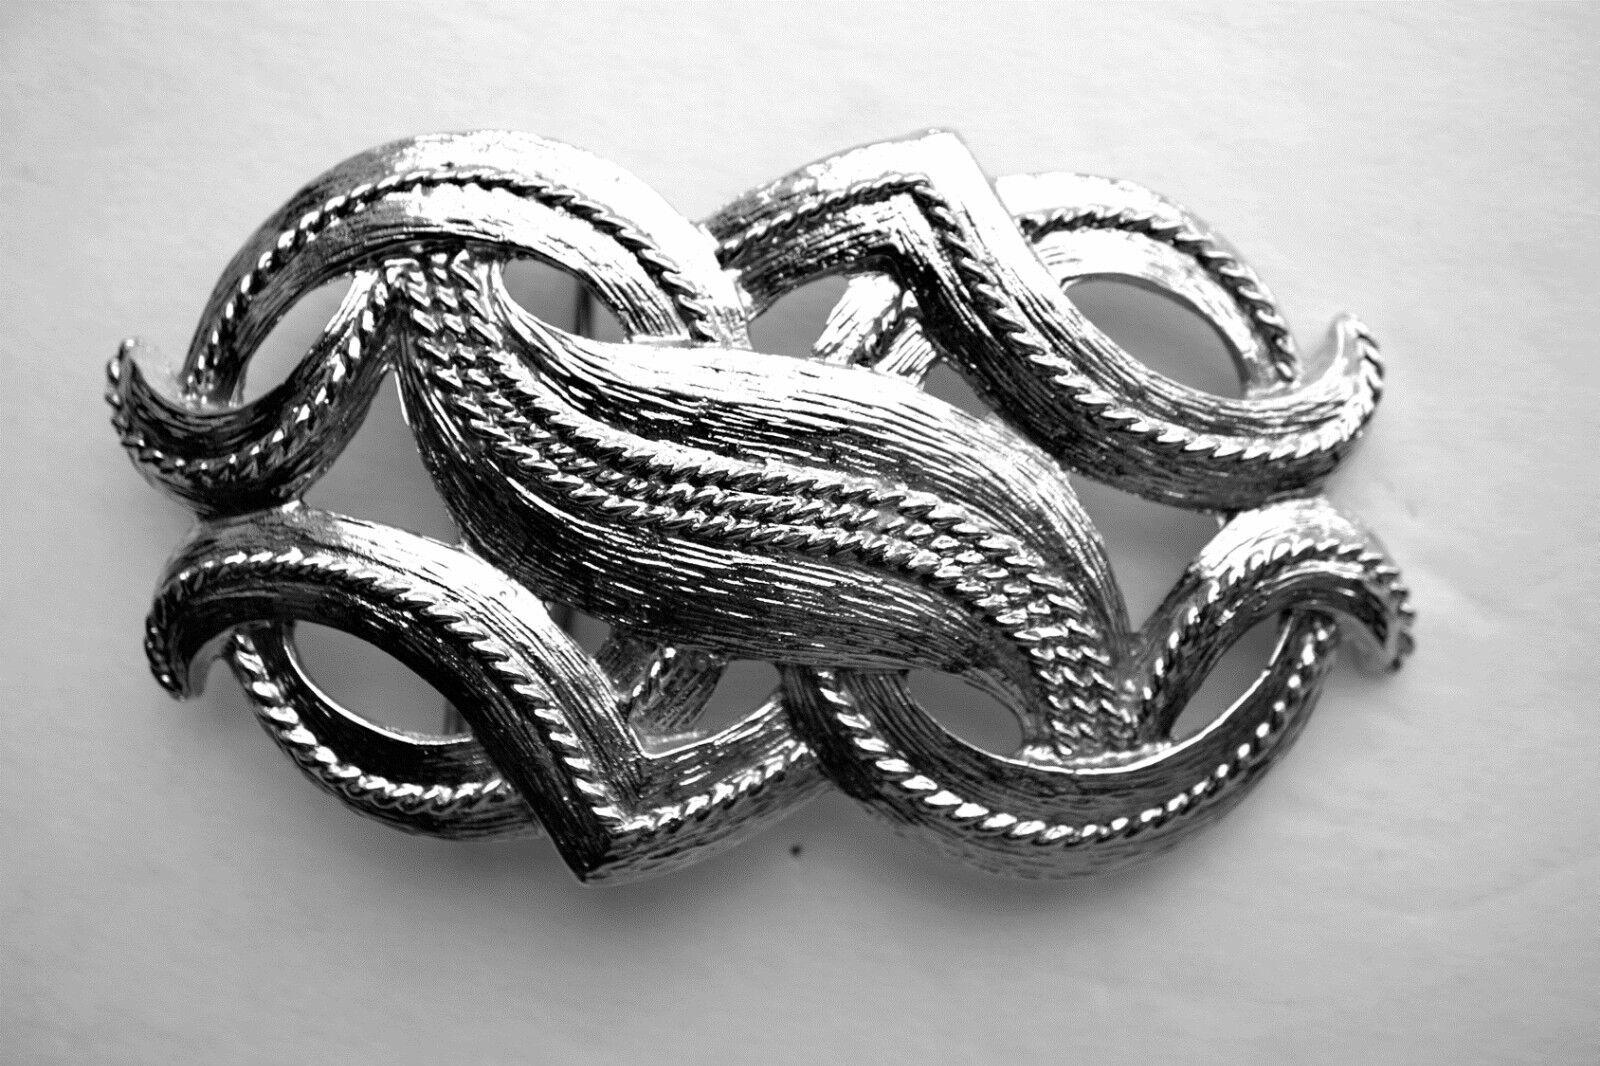 Dotty Smith Belt Buckle ~Textured Silver Tone ~ Intertwining Flourish Design